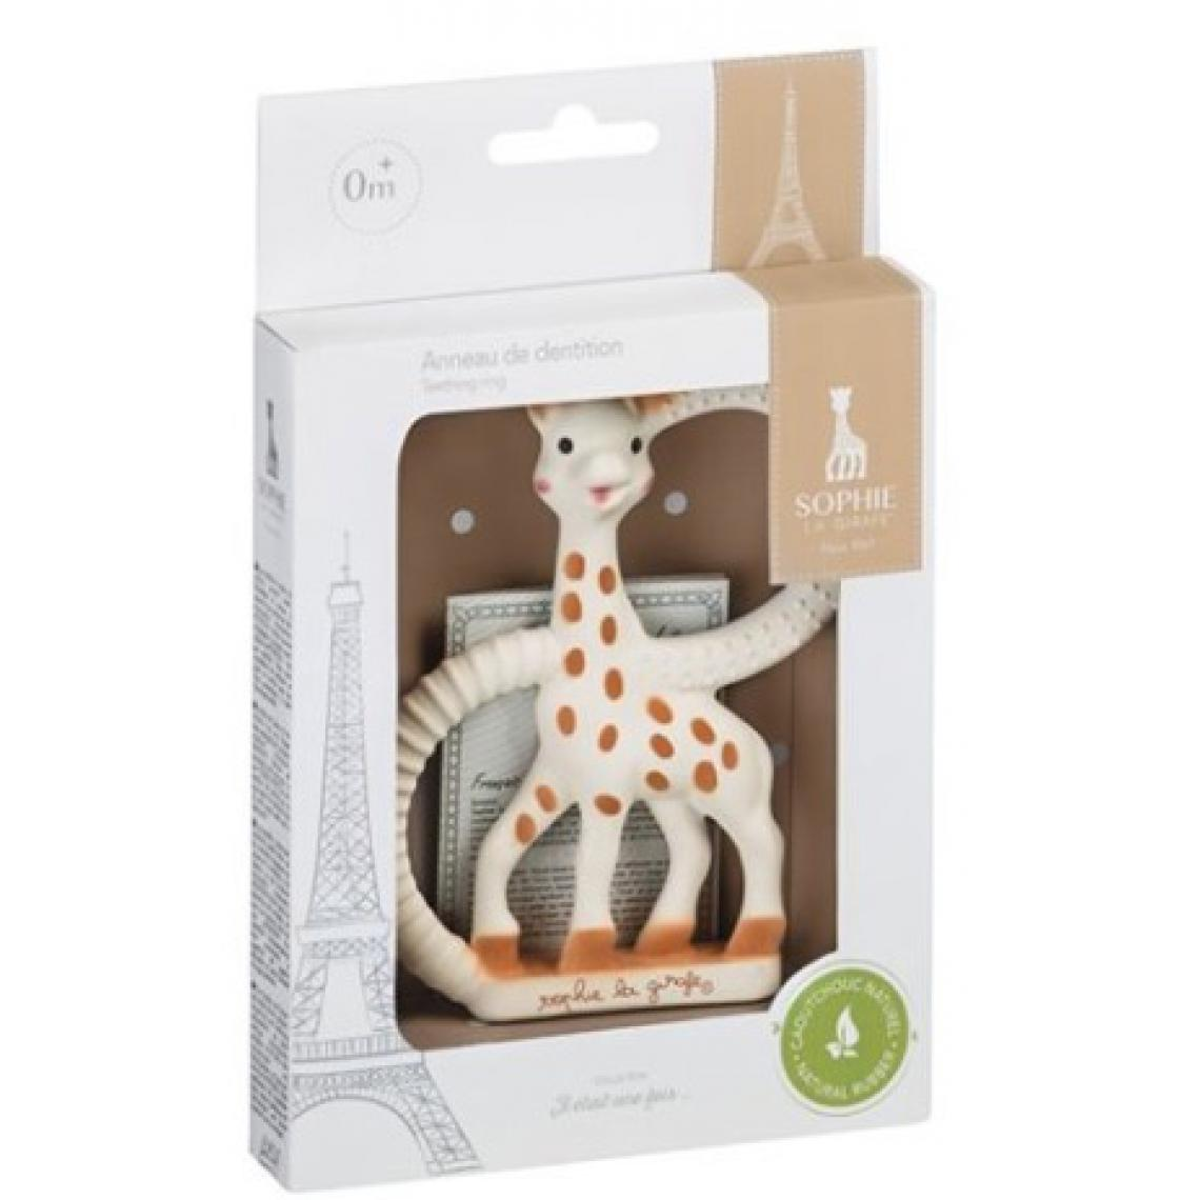 Vulli Sophie la Girafe anneau de dentition naturel